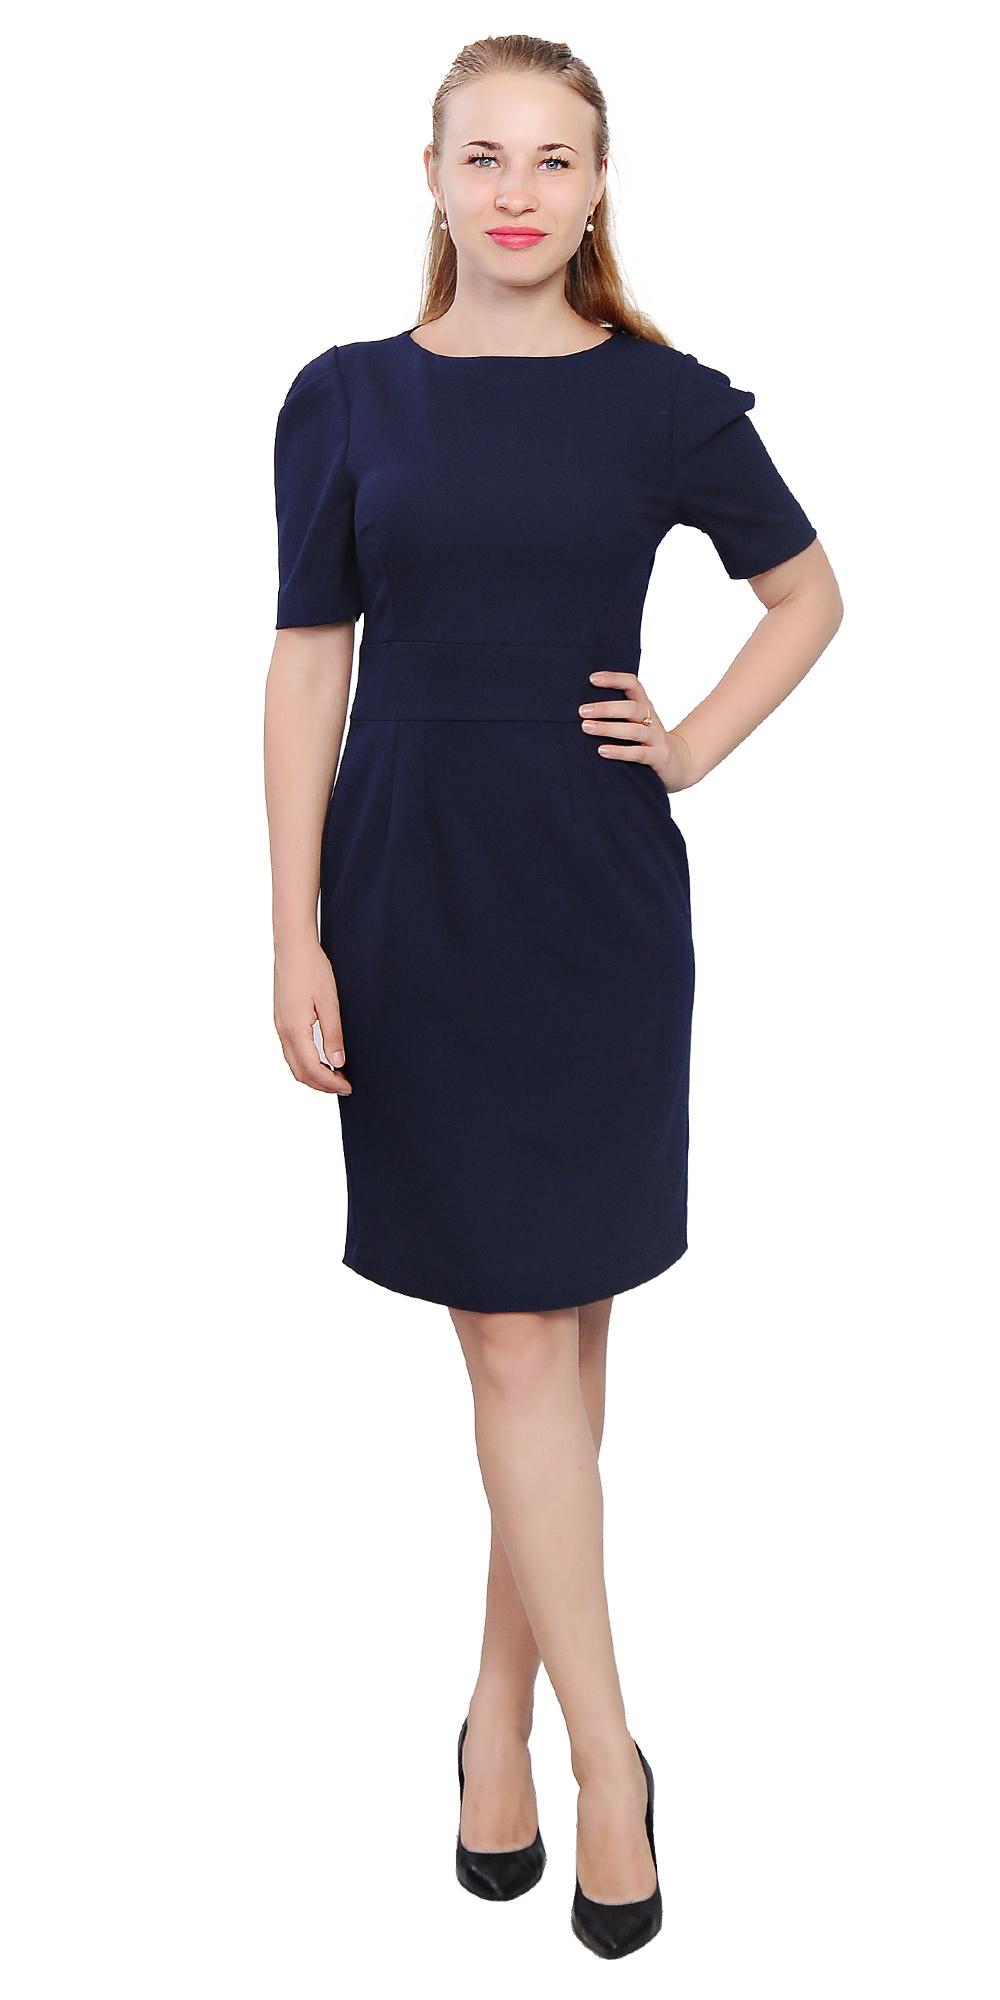 WOMEN'S ELEGANT OFFICE WORK BUSINESS DRESS CLASSIC MODEST ...